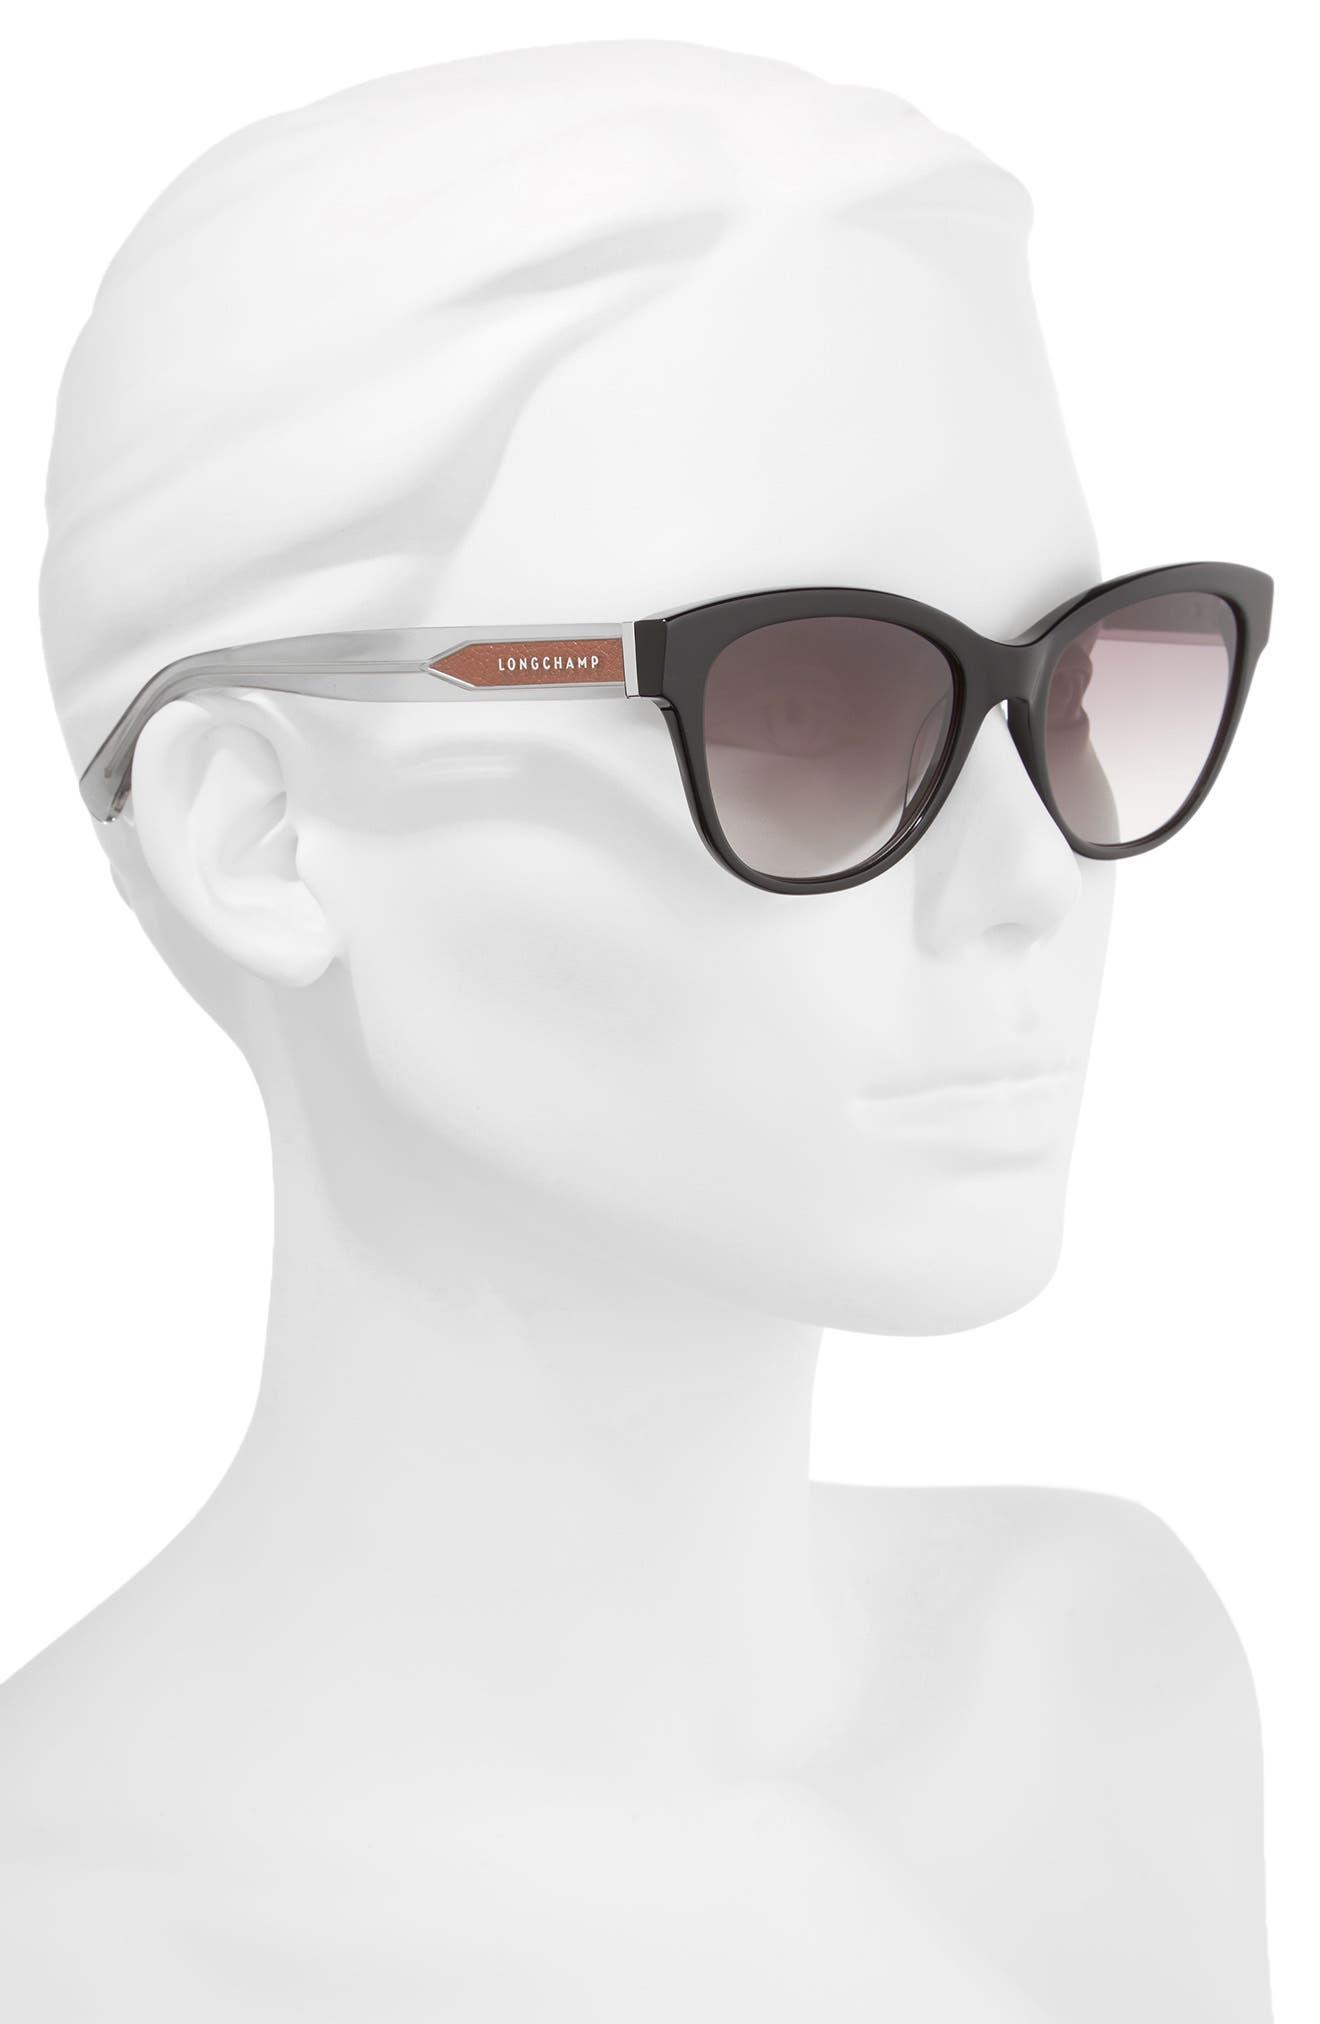 54mm Gradient Lens Sunglasses,                             Alternate thumbnail 2, color,                             Black